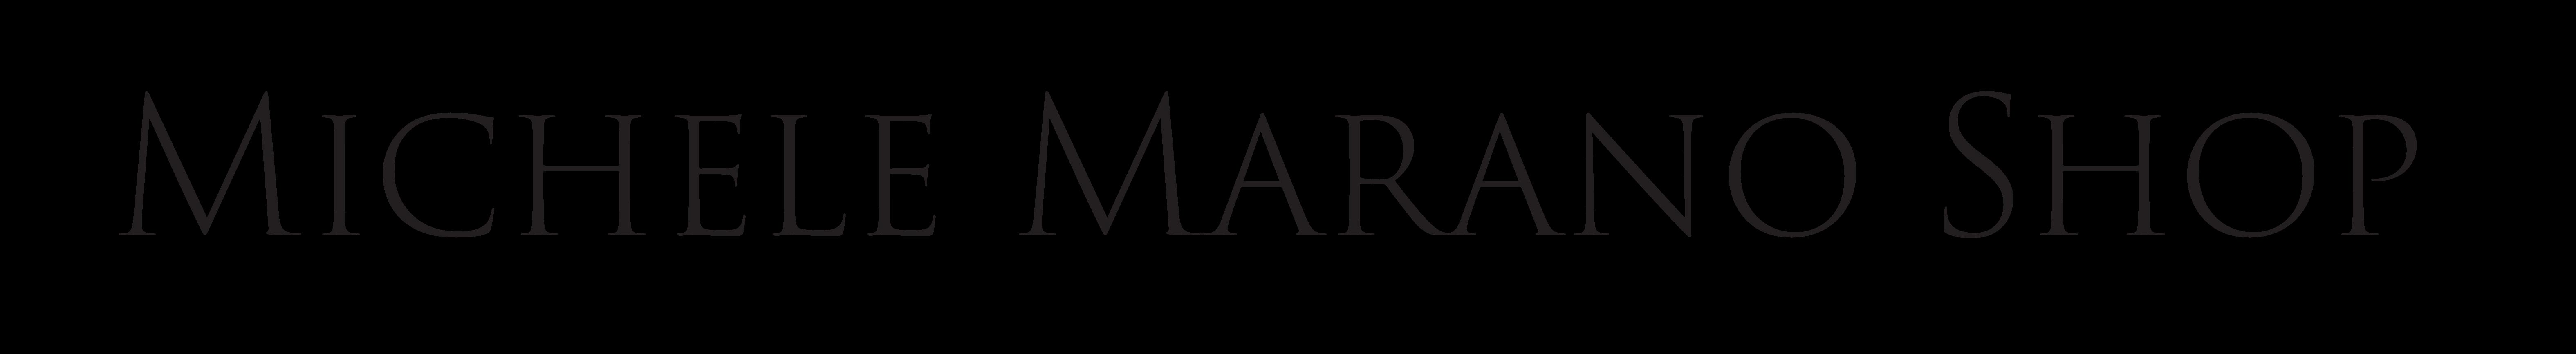 Michele Marano Shop